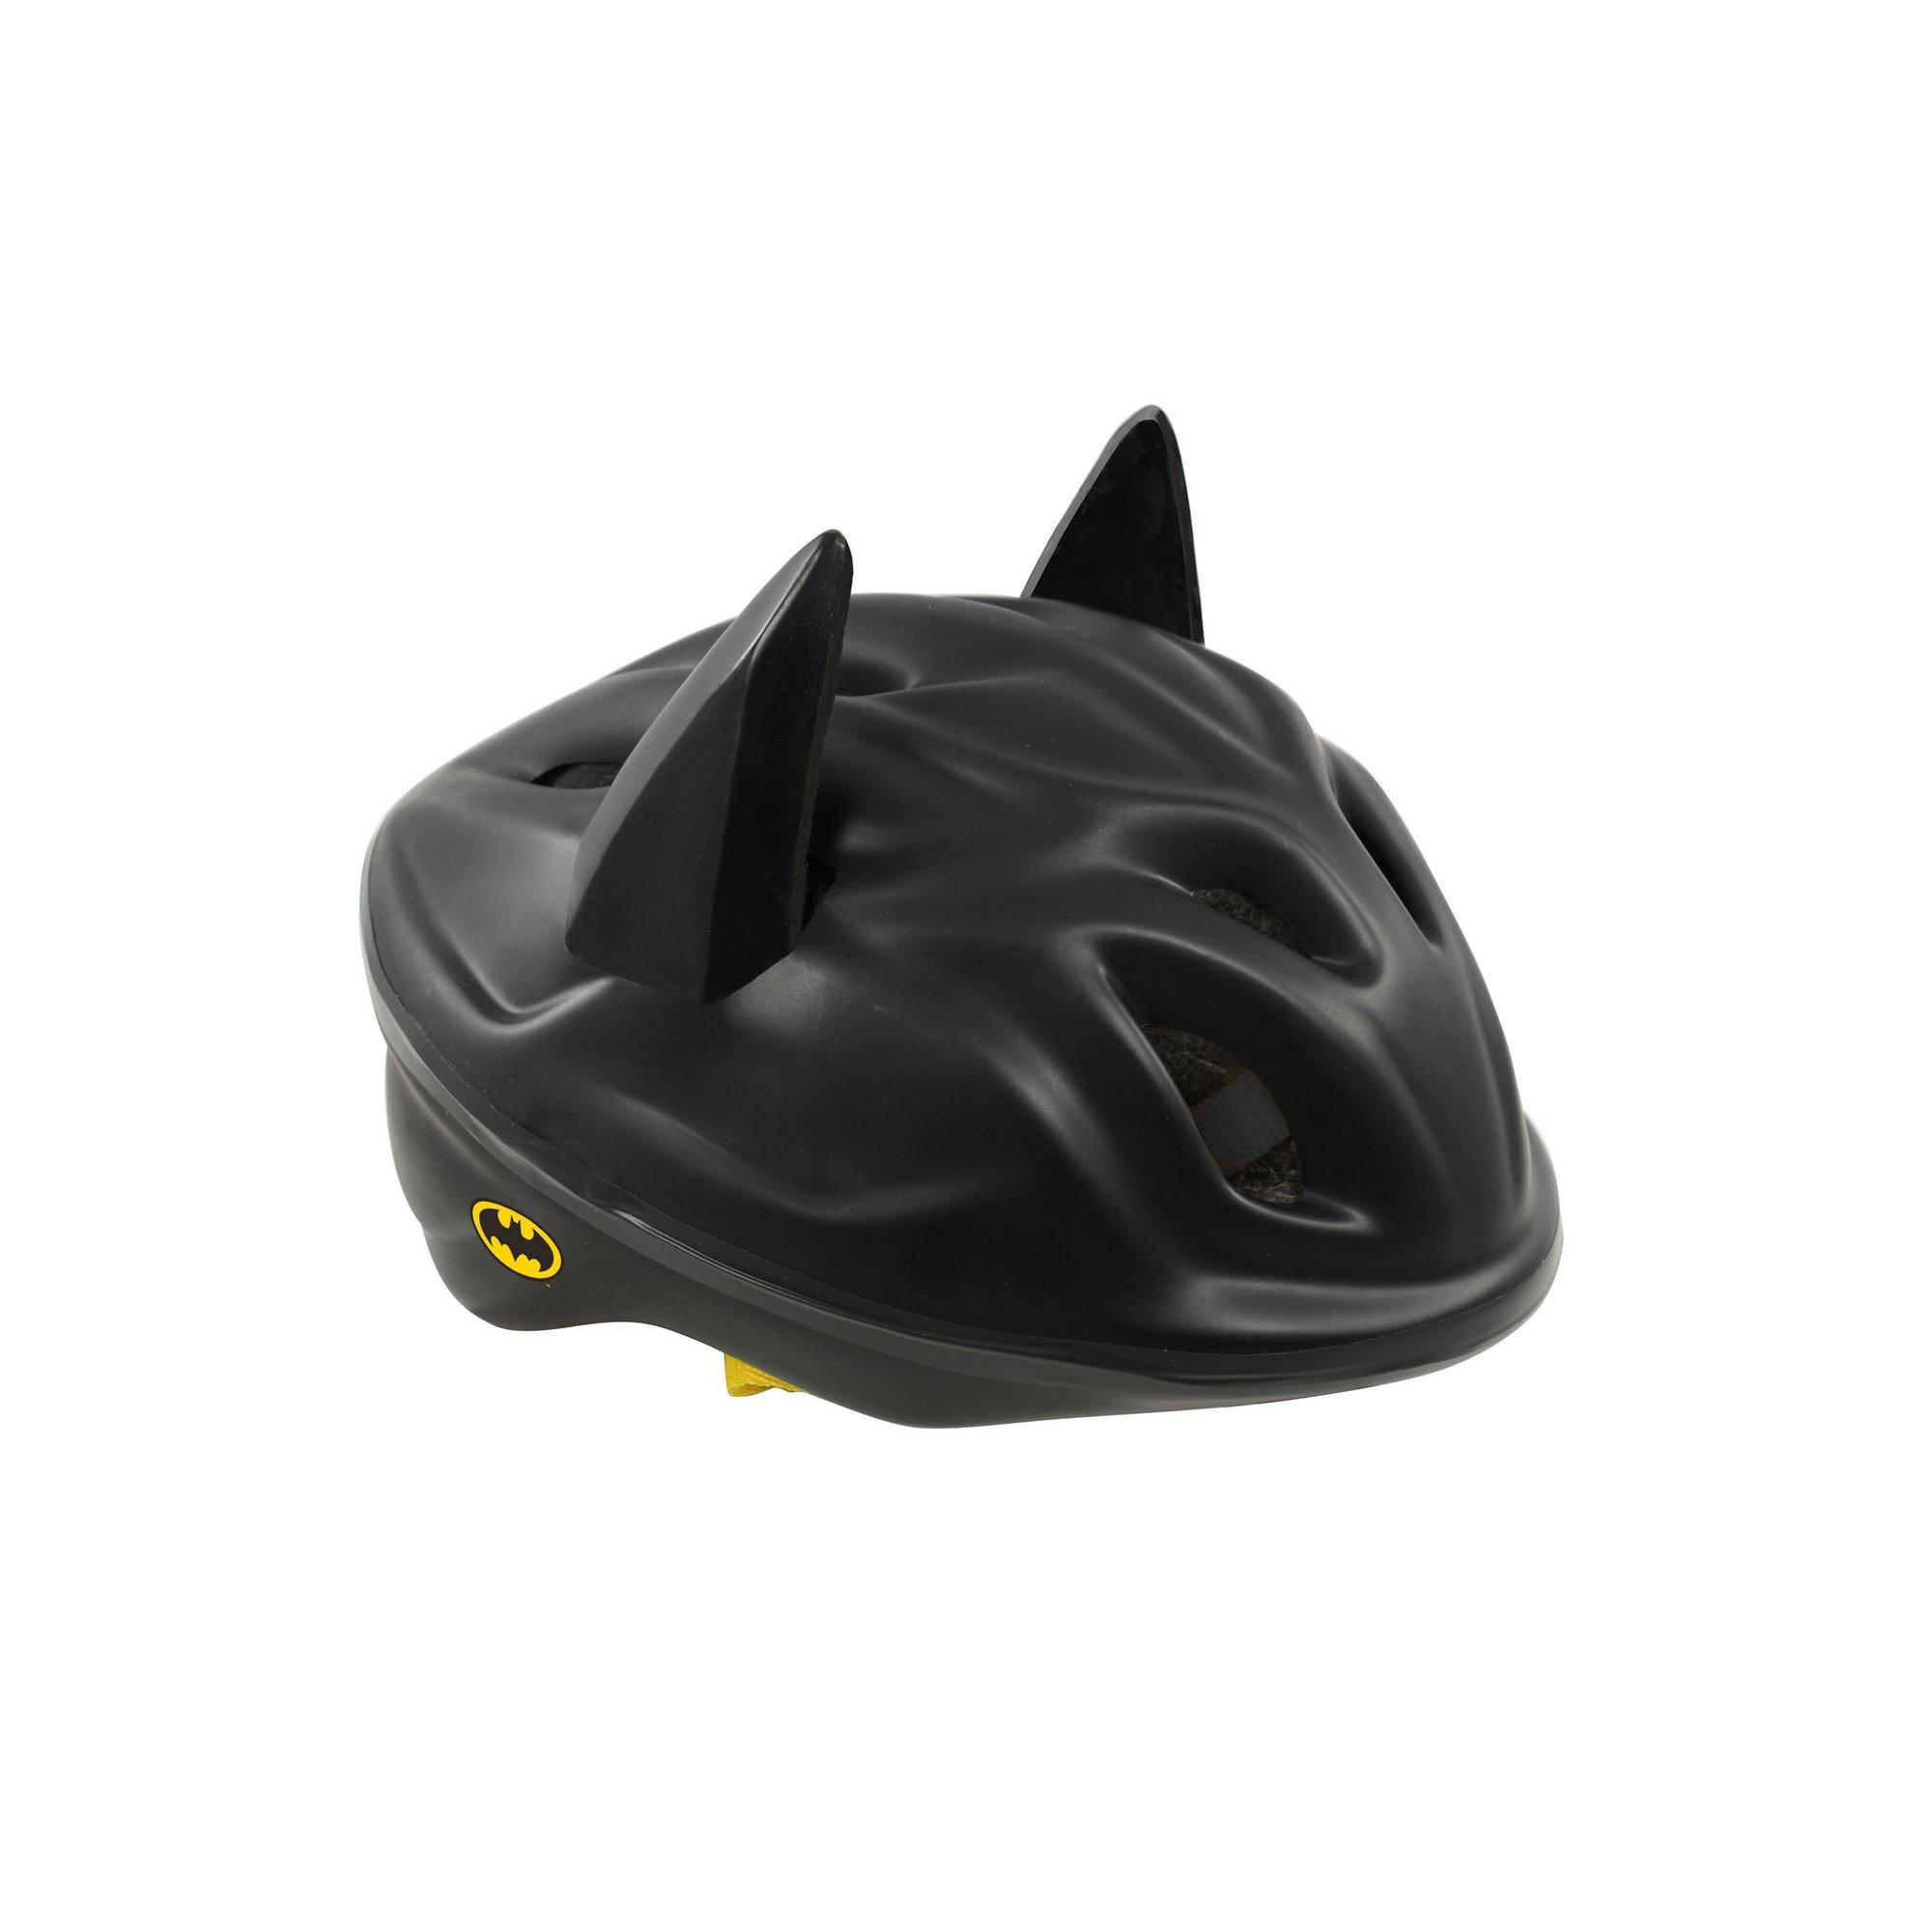 Image of Batman 3D Safety Helmet